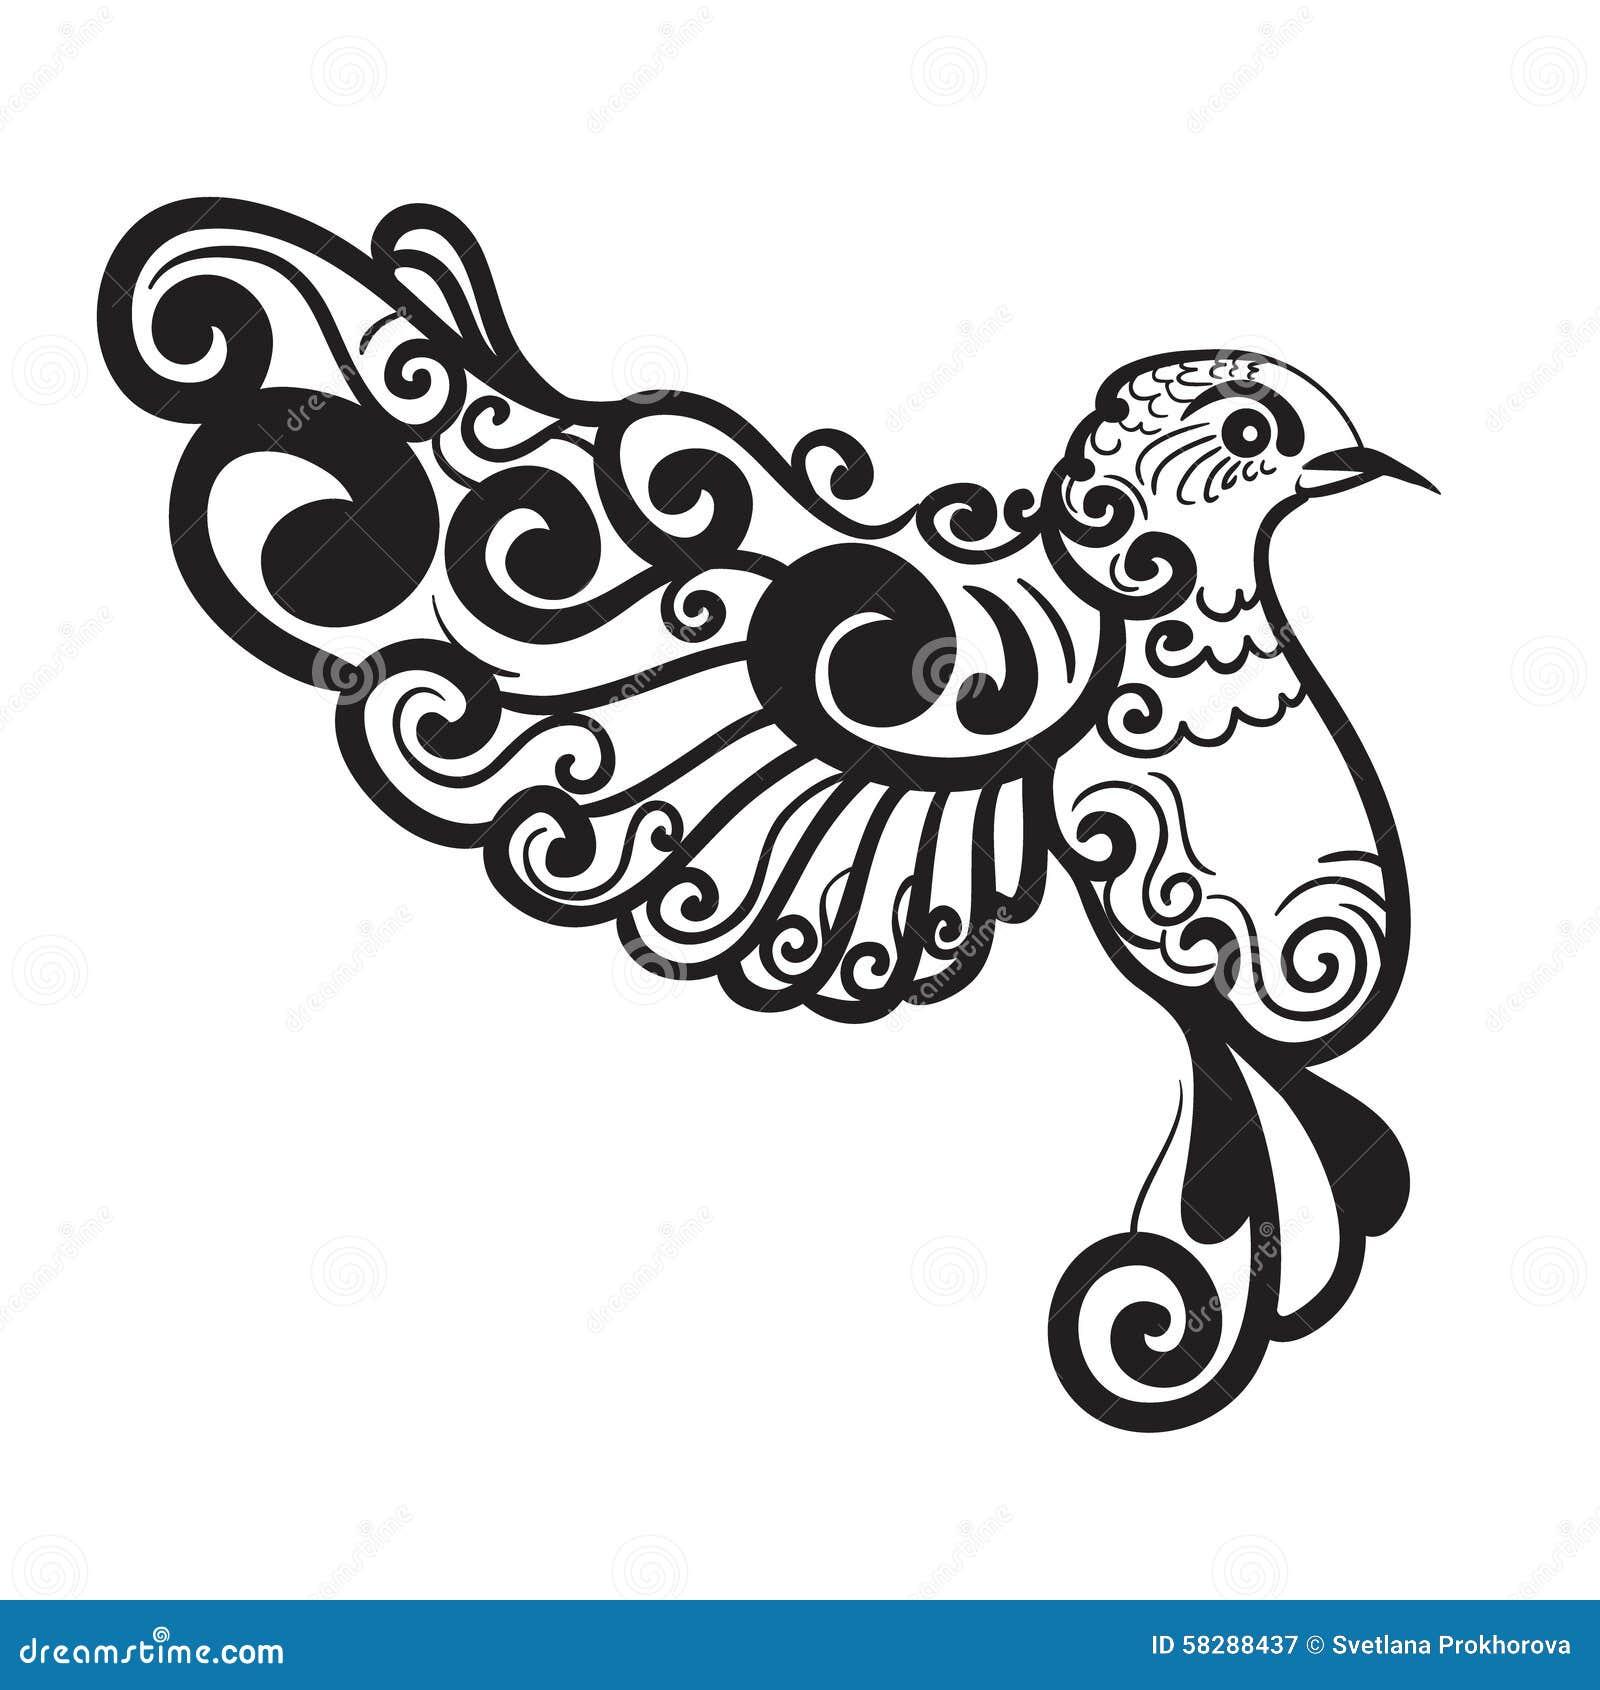 Stylized bird. Beautiful decorative vintage design elementDove Bird Drawing Tattoo